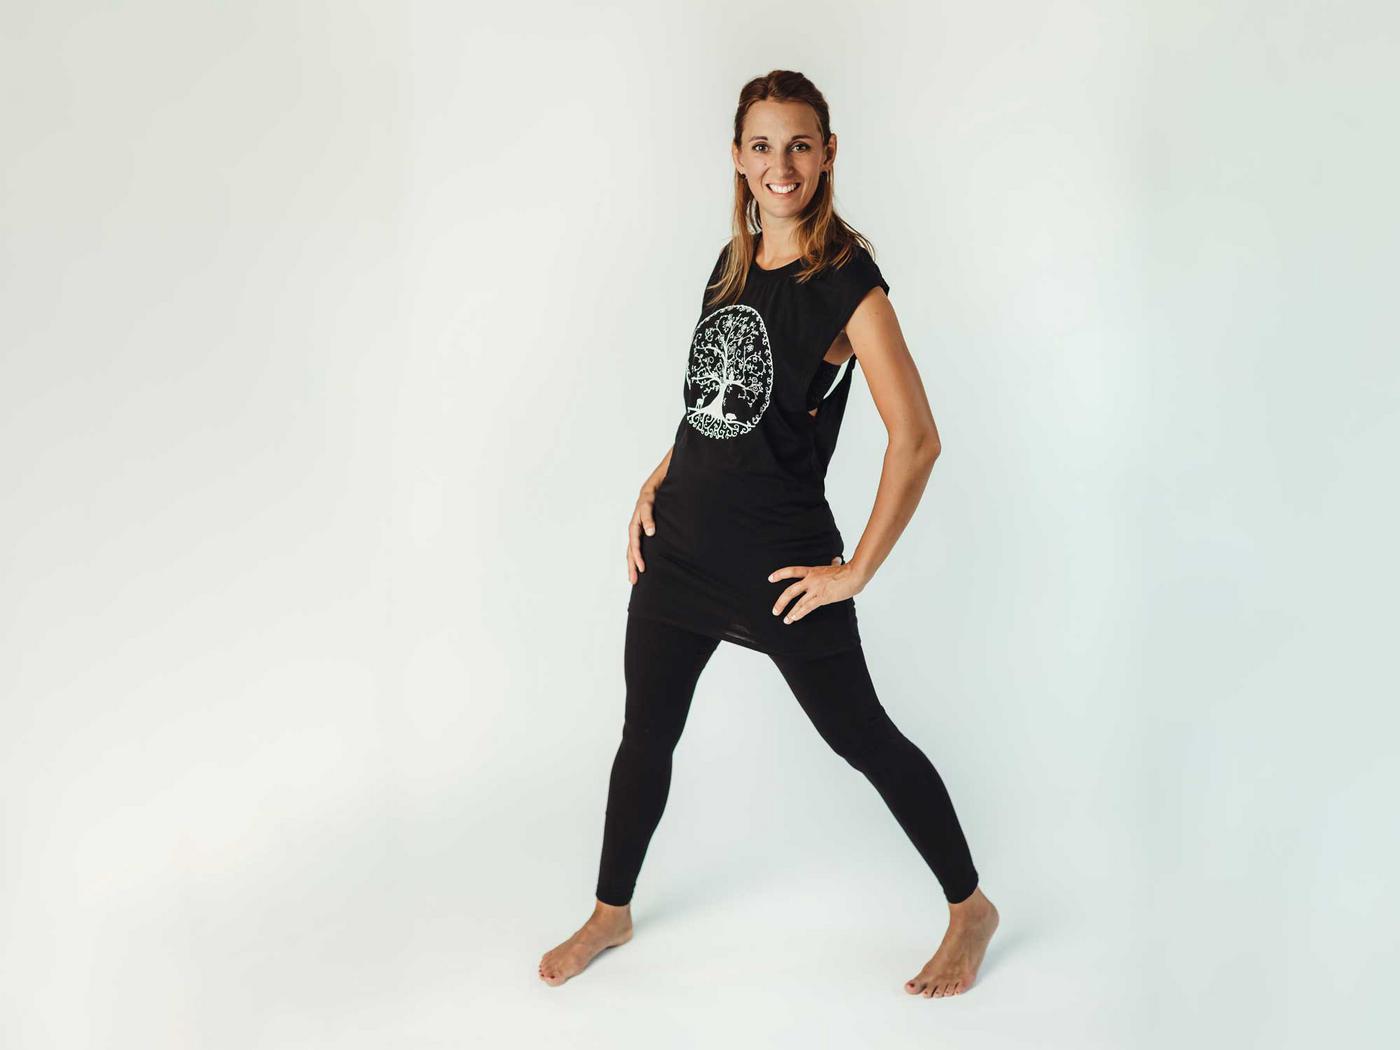 Dance 4 Fitness